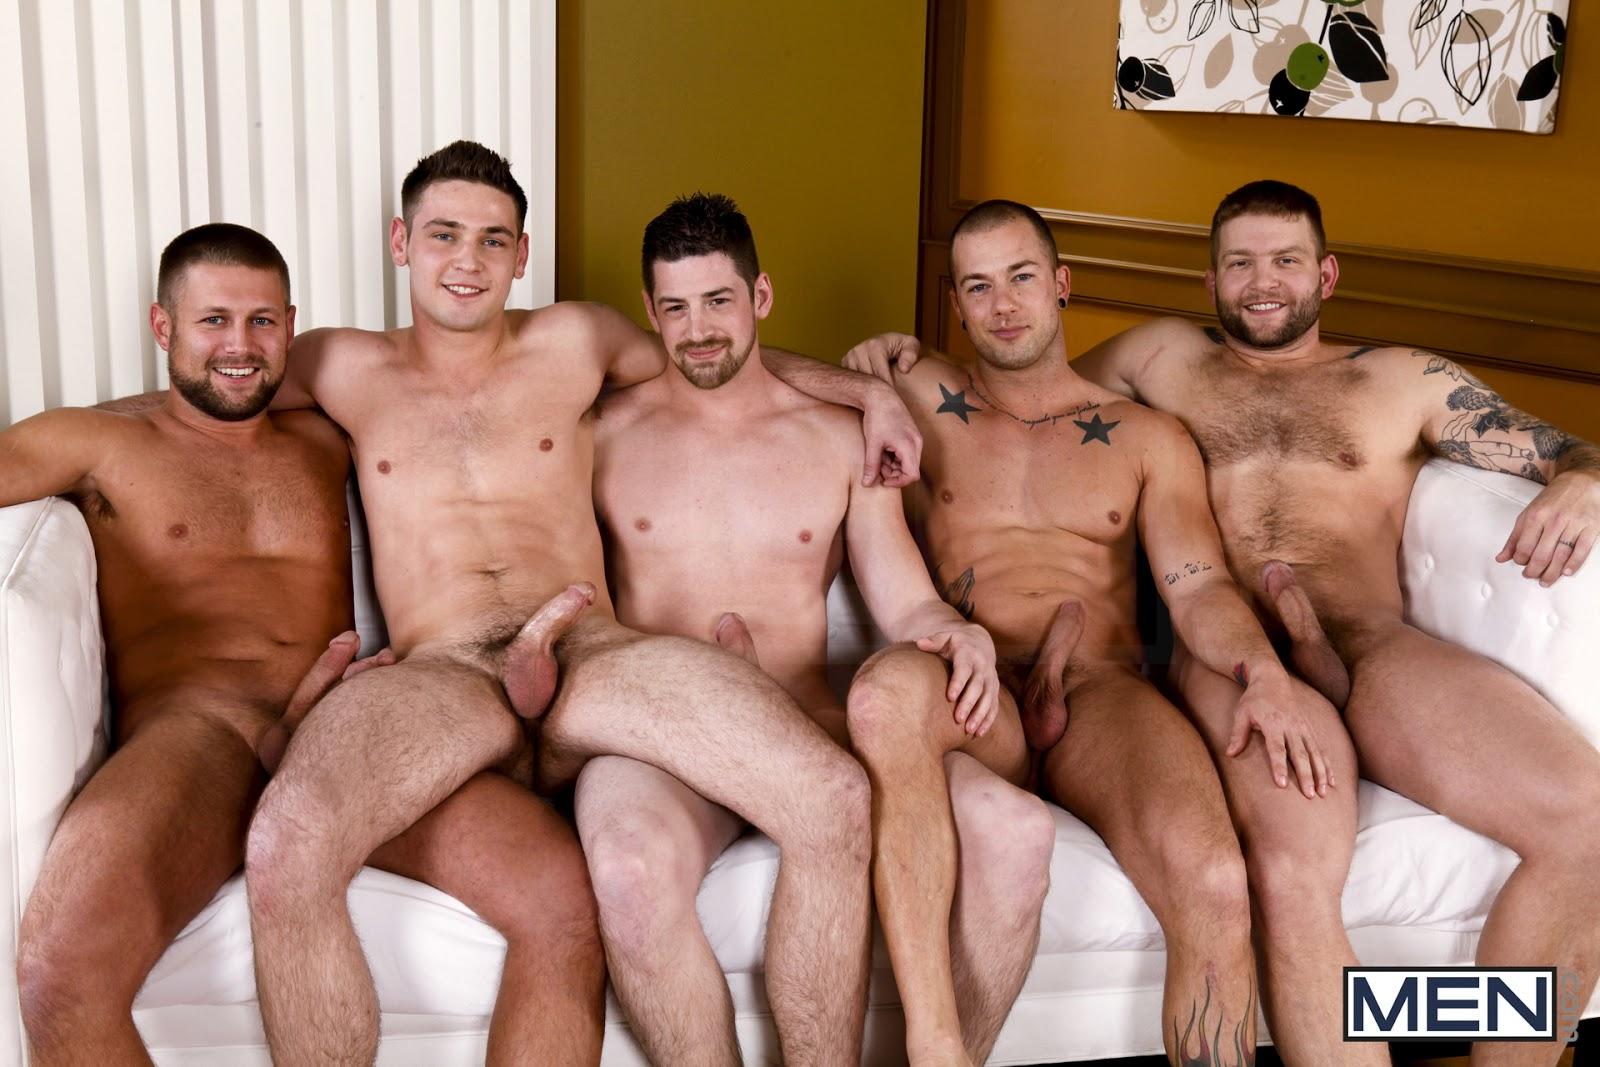 Men who need bras